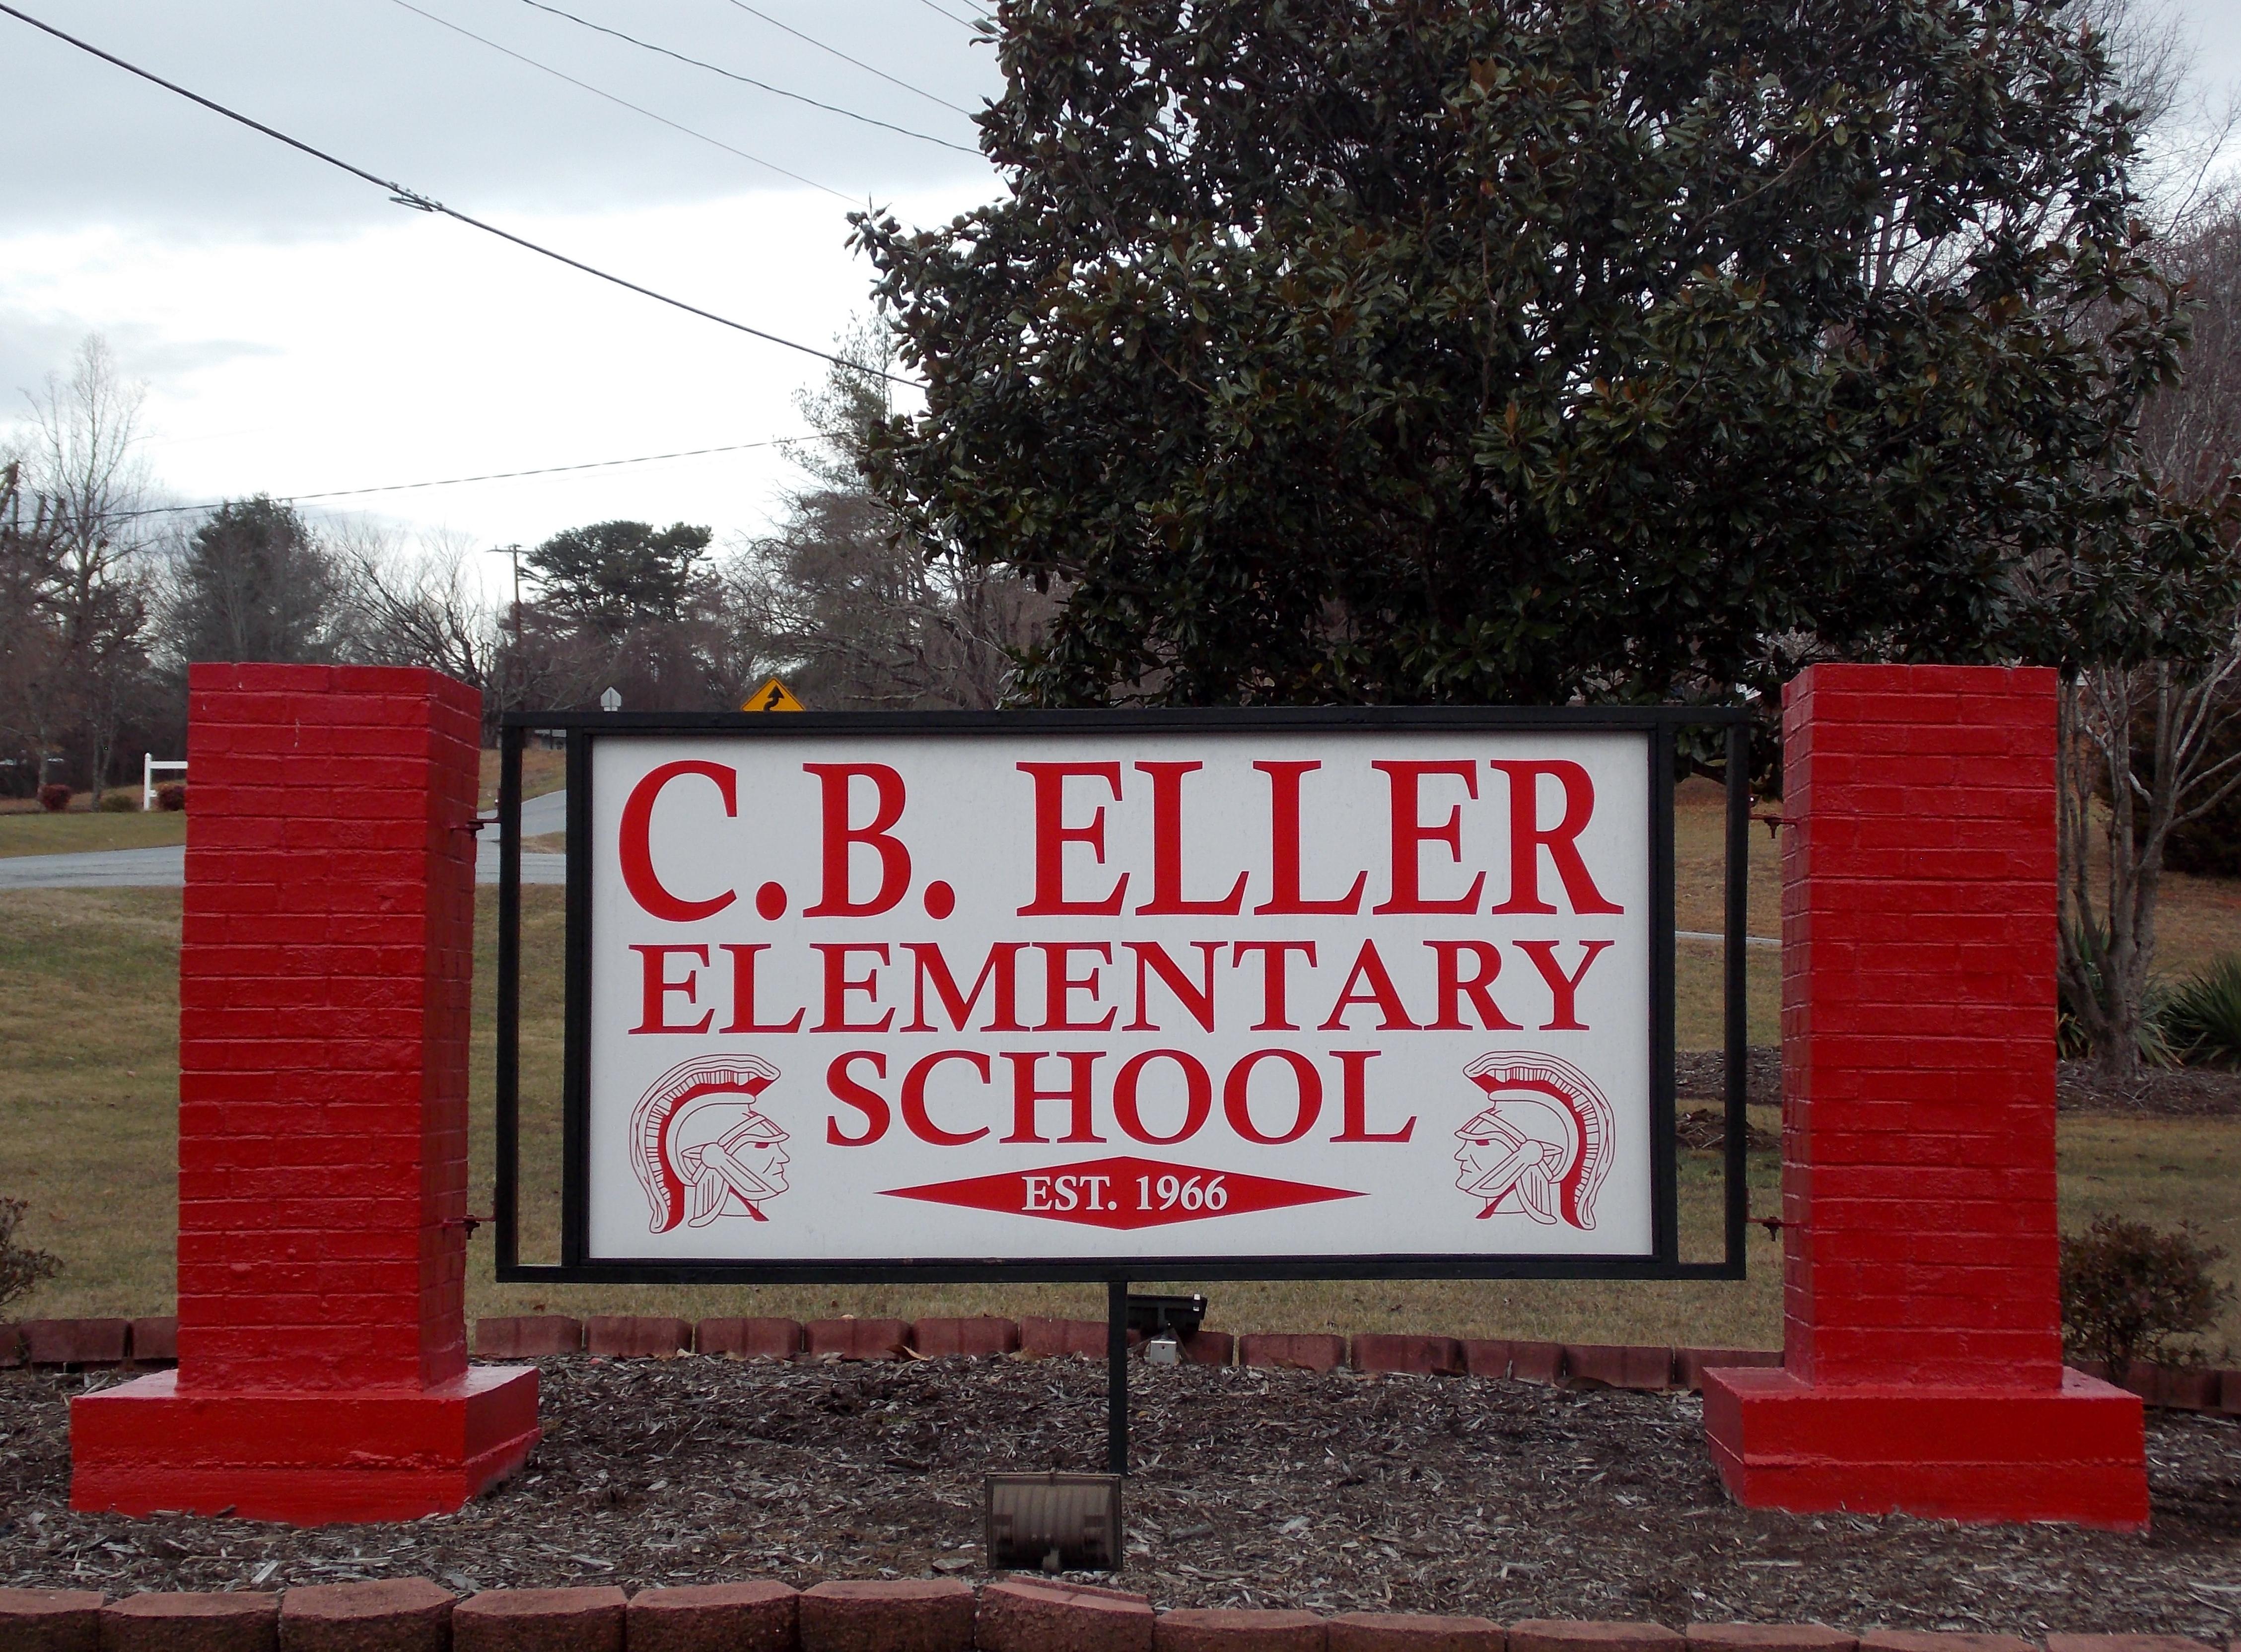 Welcome to C.B. Eller Elementary School Image